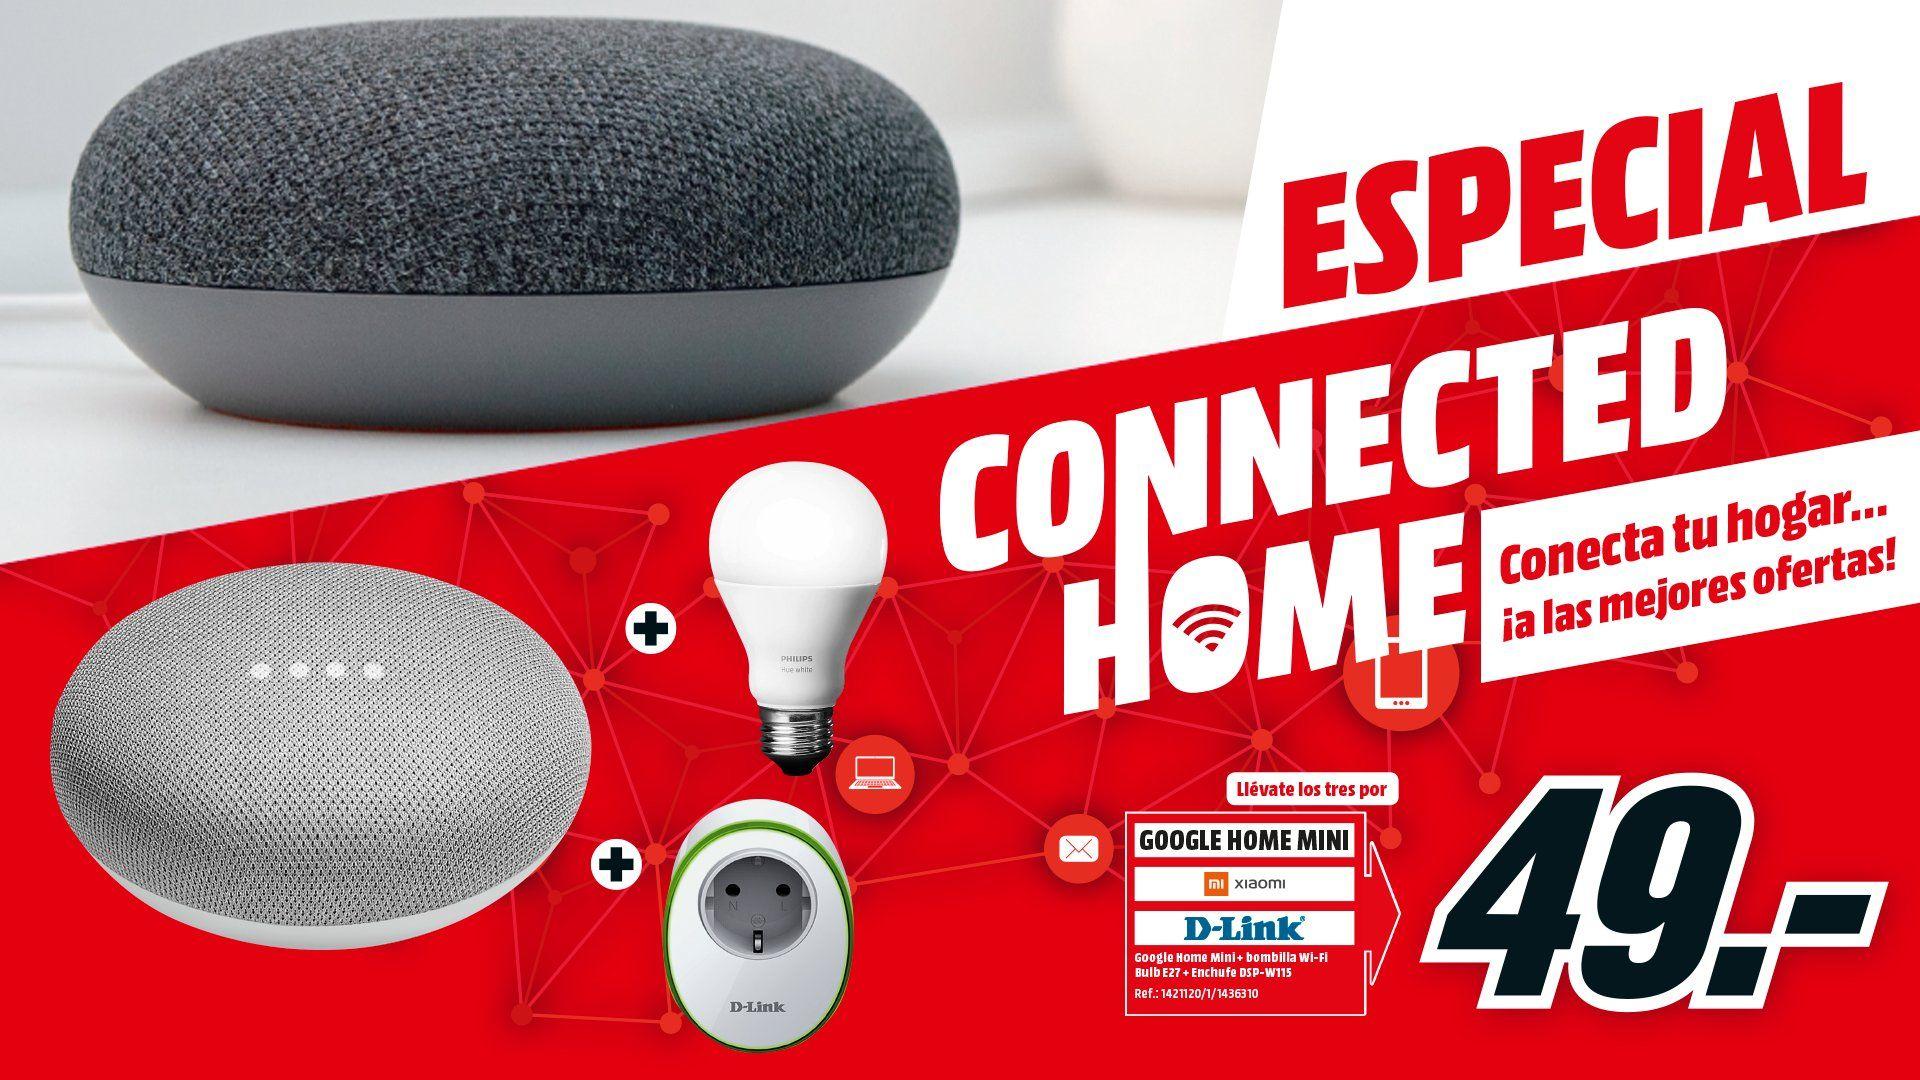 Google Home Mini + Bombilla + Enchufe por 50 euros